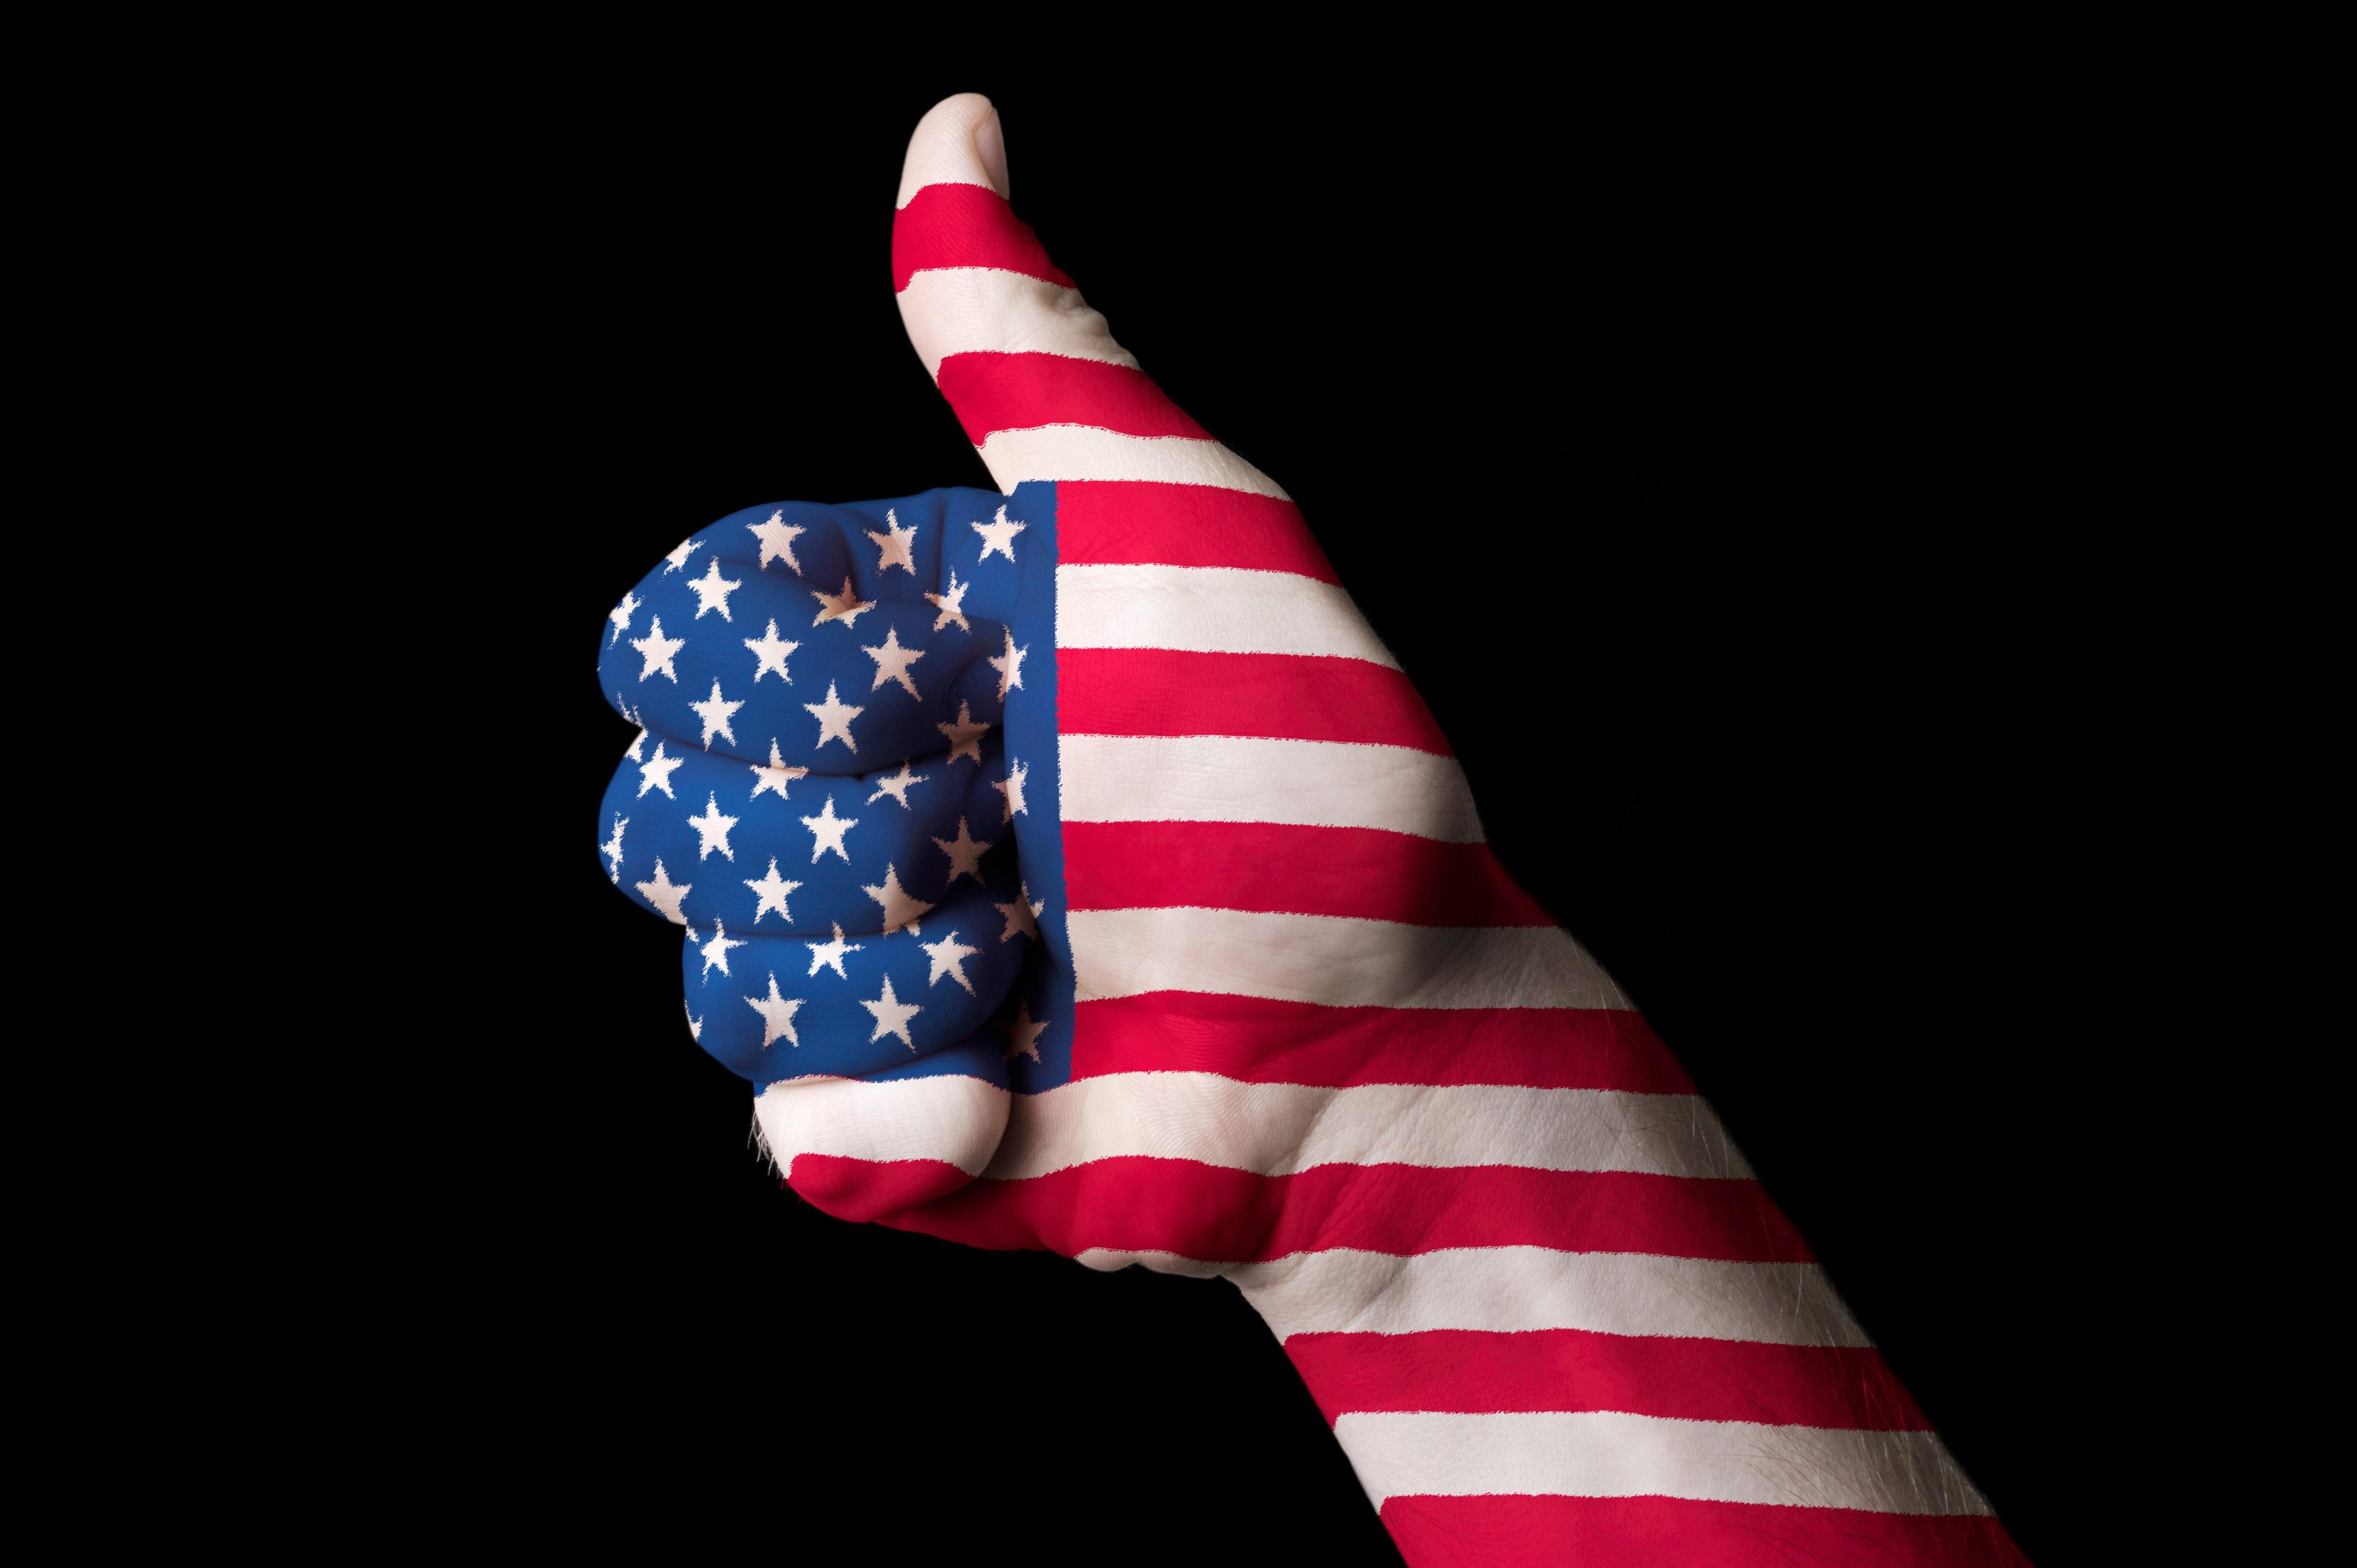 thumbs-up-politics-usa-3500x2329.jpeg